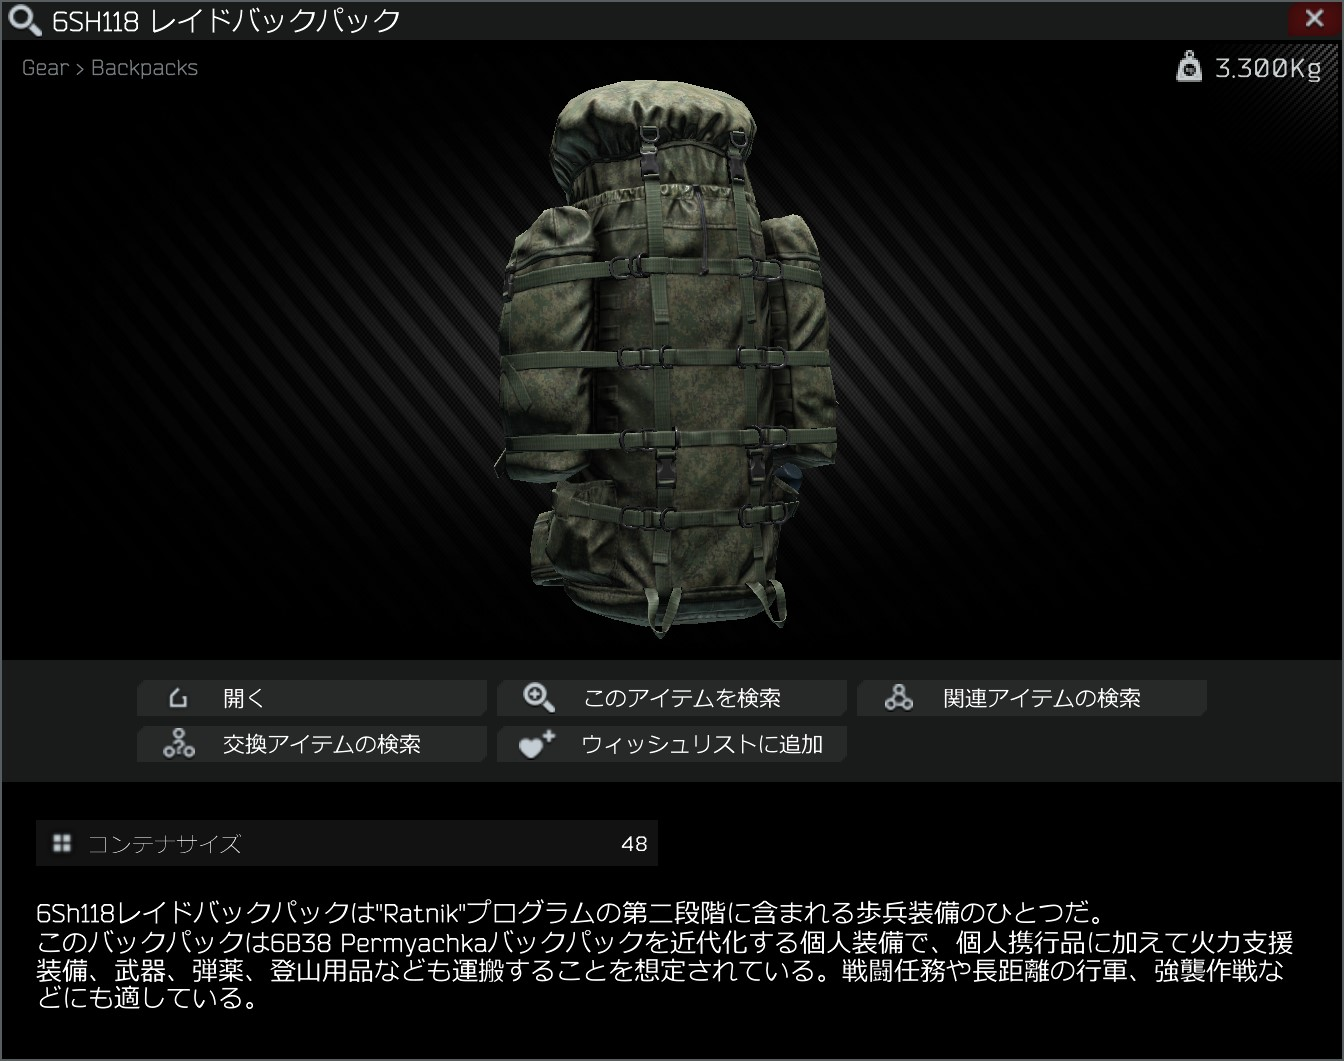 6SH118 raid backpack.jpg